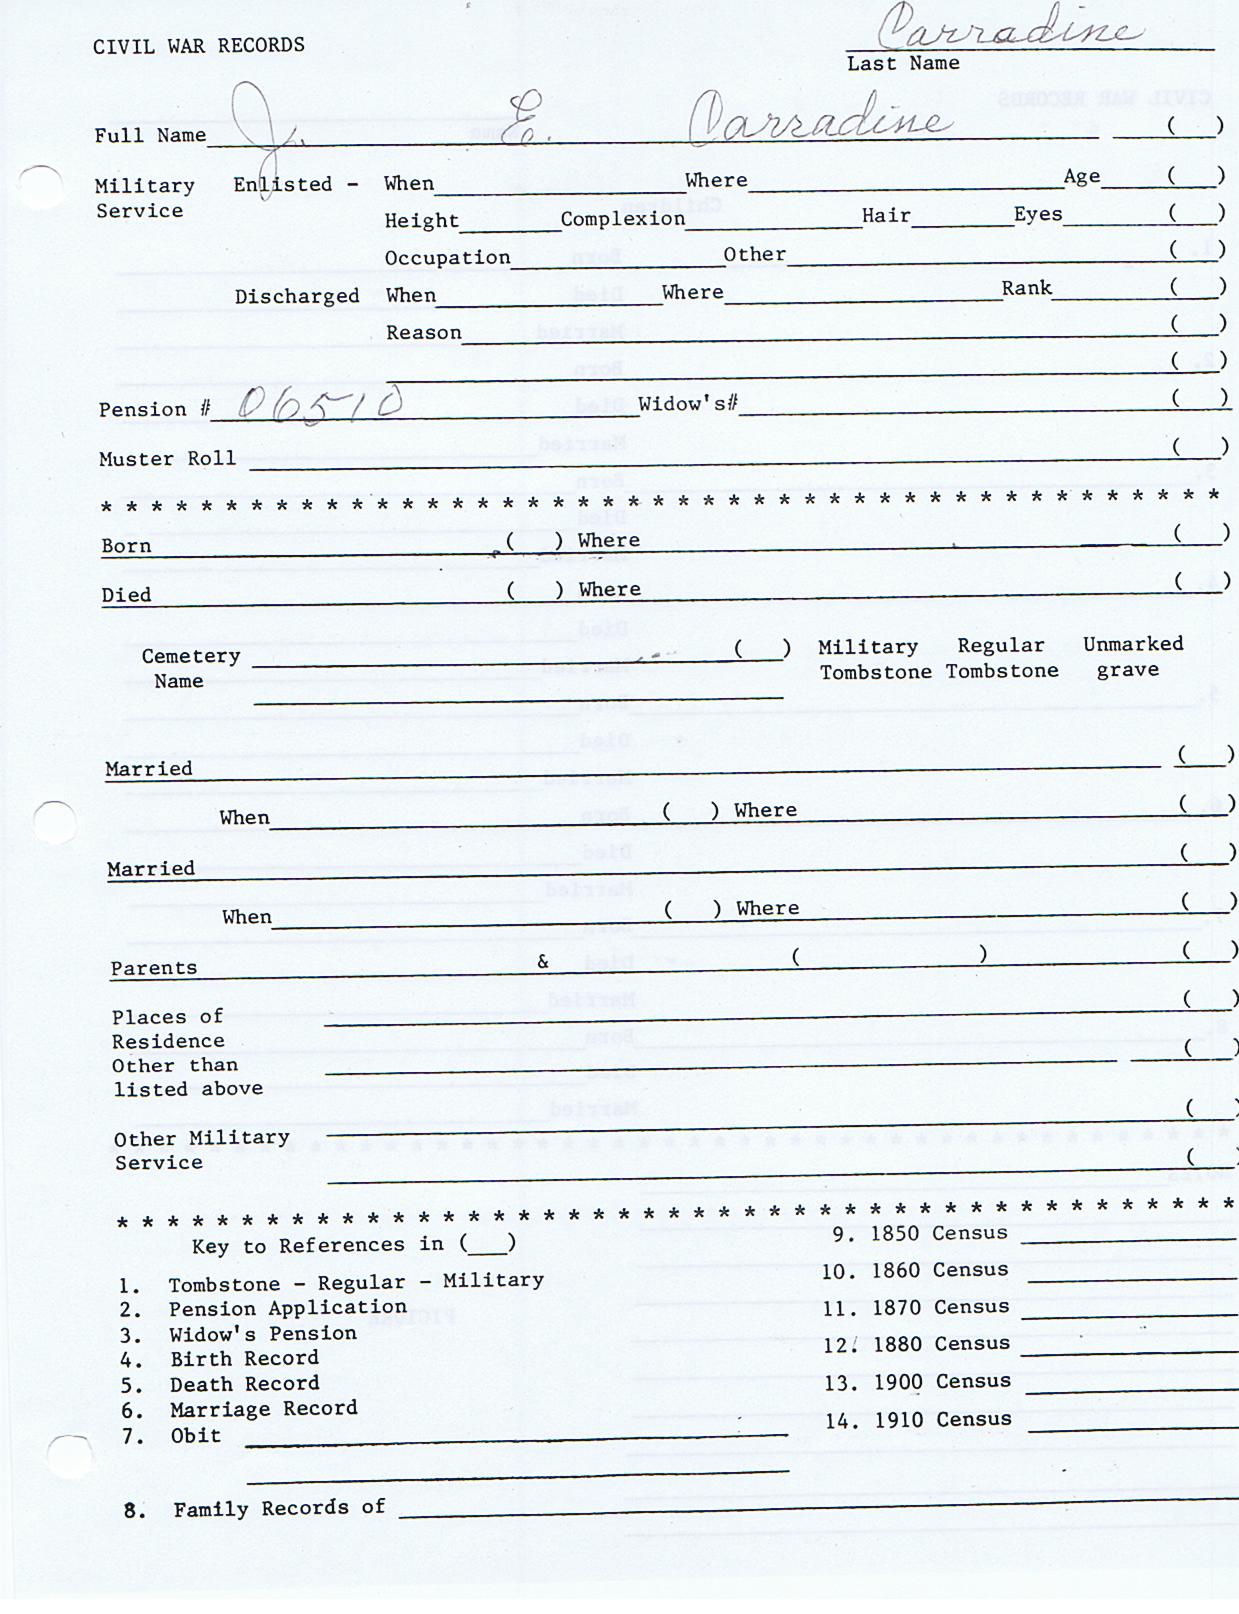 carradine-kaufman_civil_war_records-3524